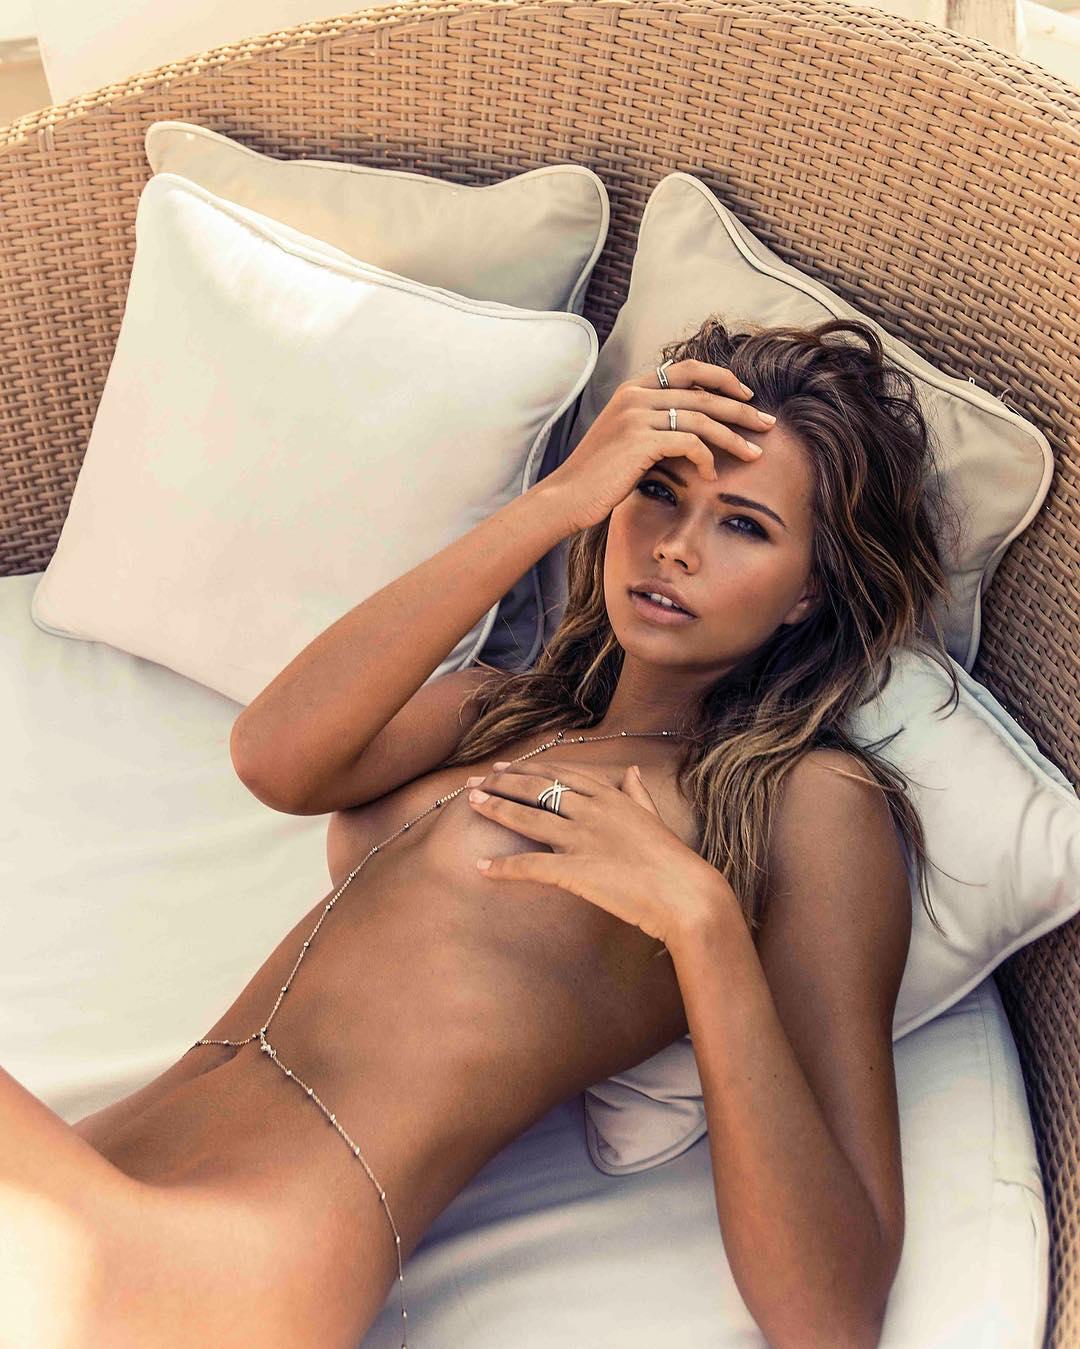 Sandra-Kubicka-Topless-1-1